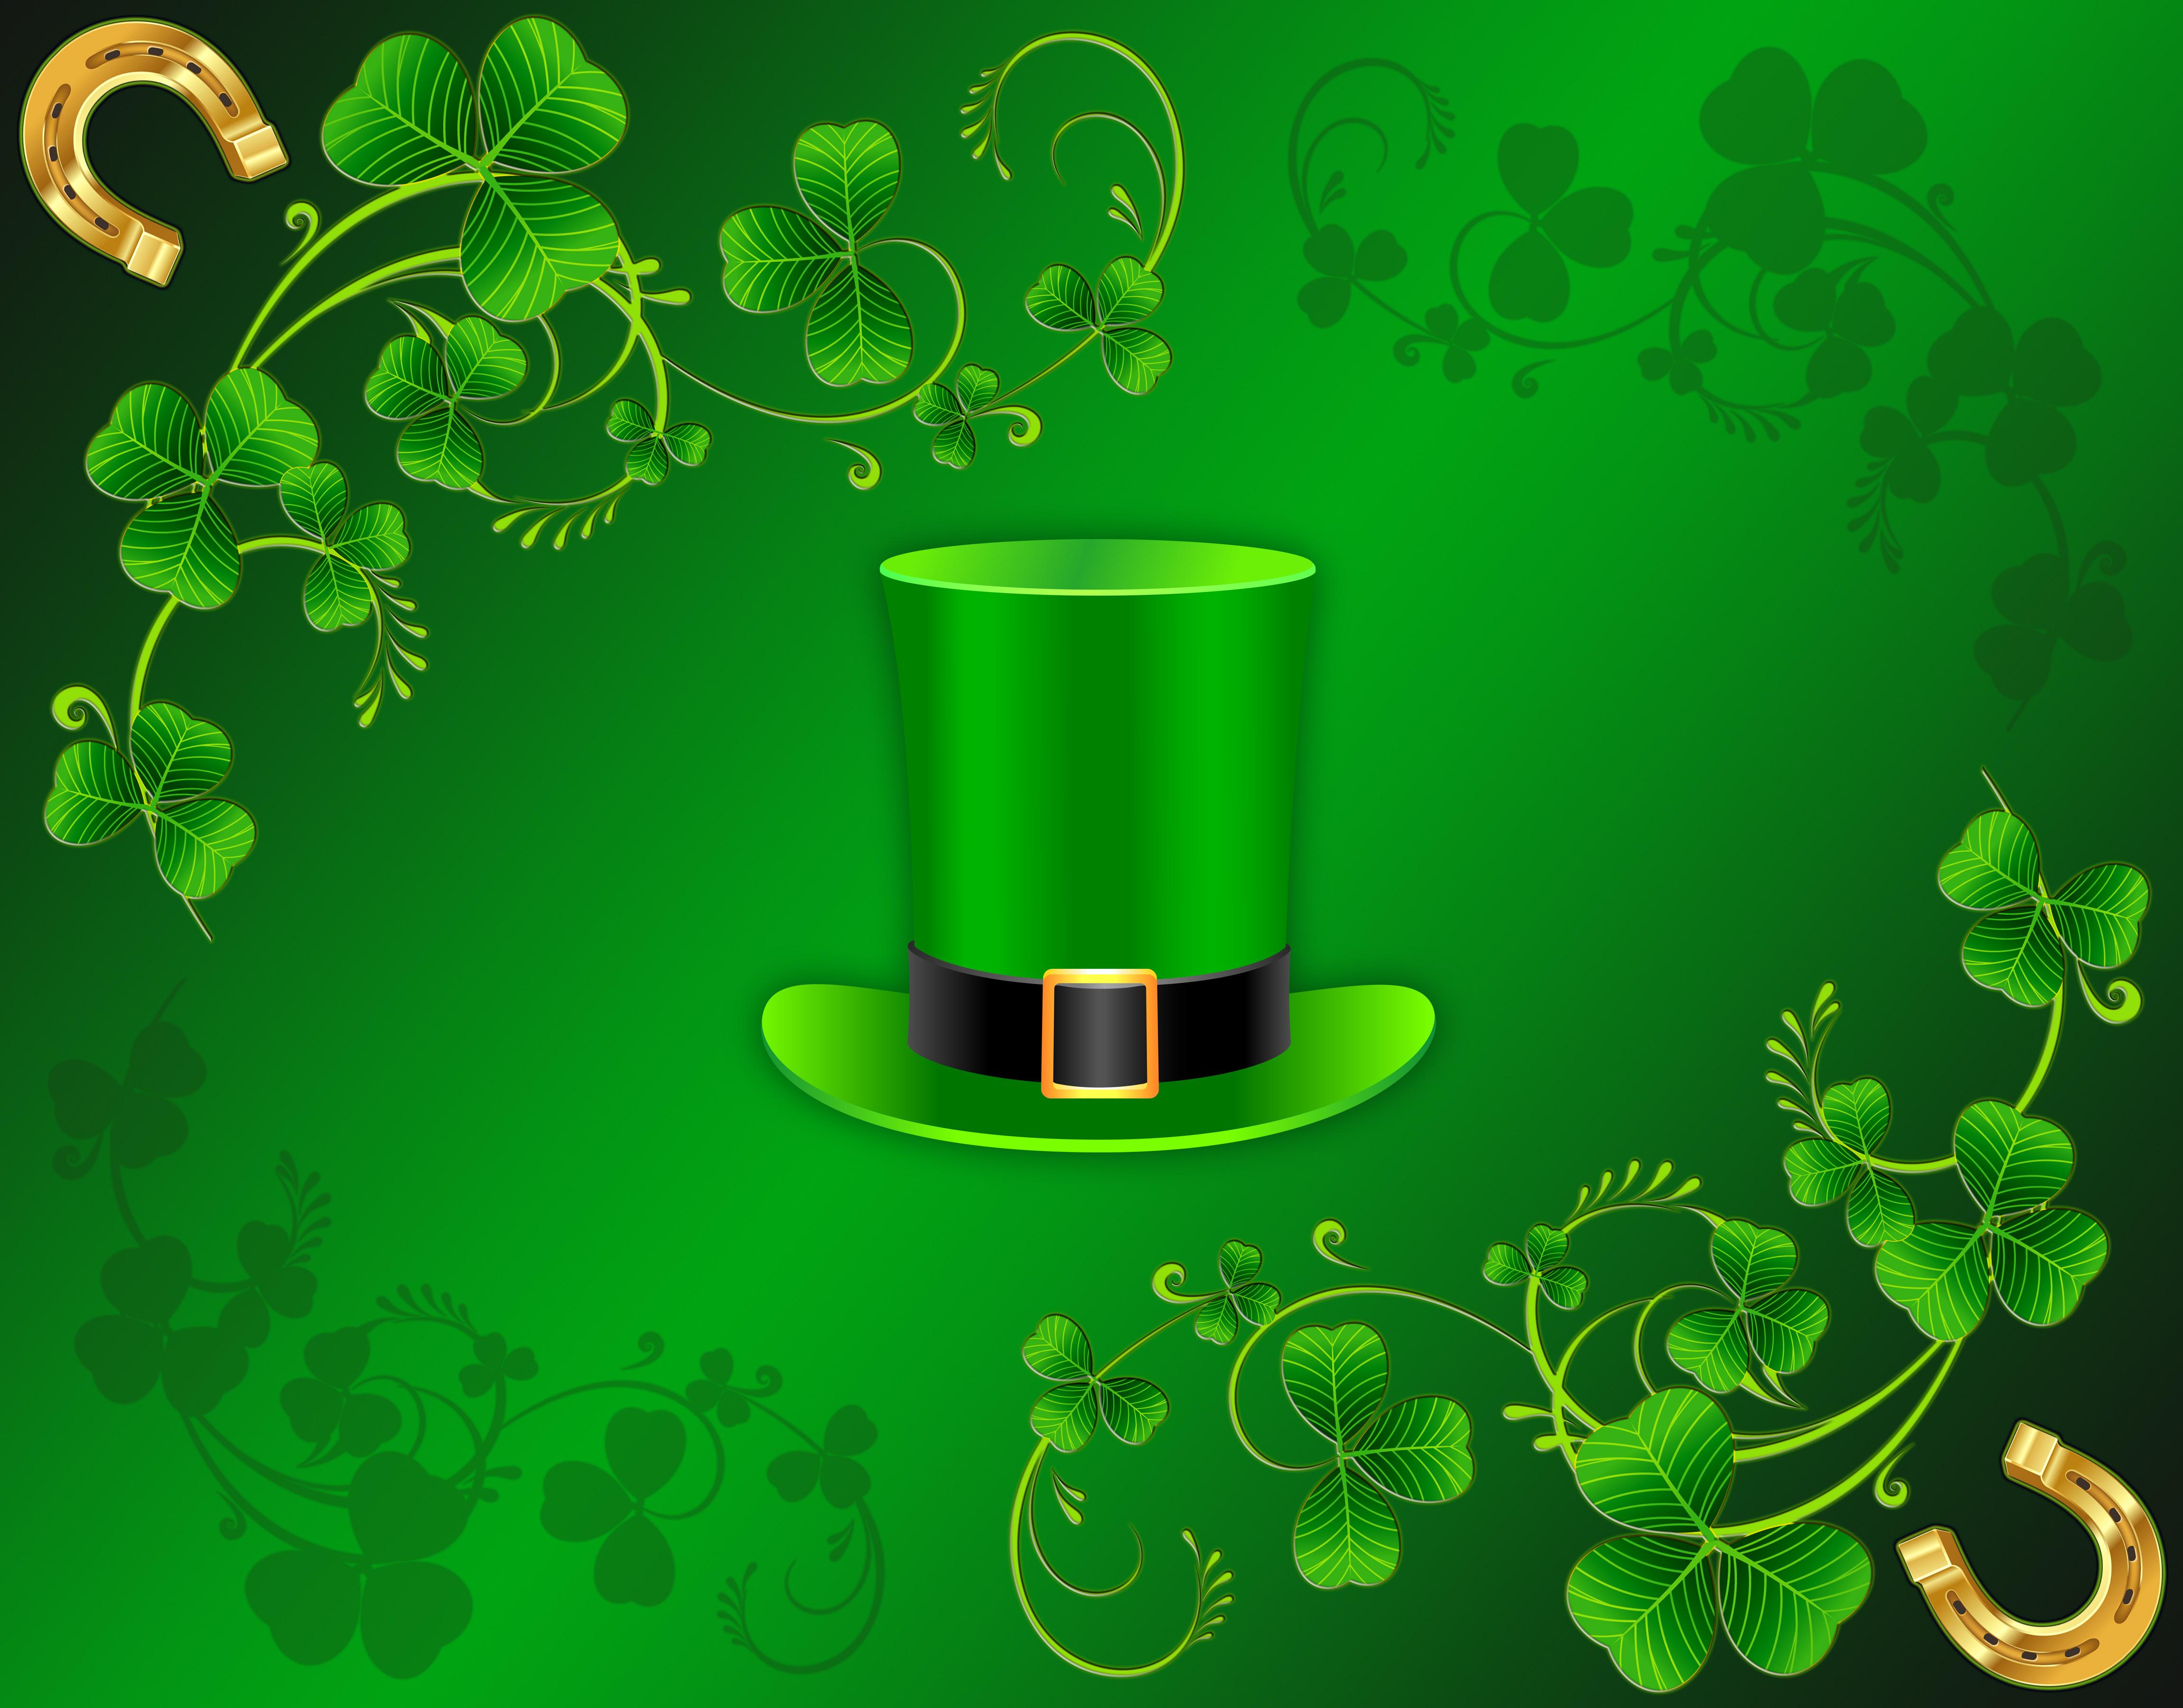 St. Patrick's Day Dickson St. Pub Crawl Tomorrow – UATV Online